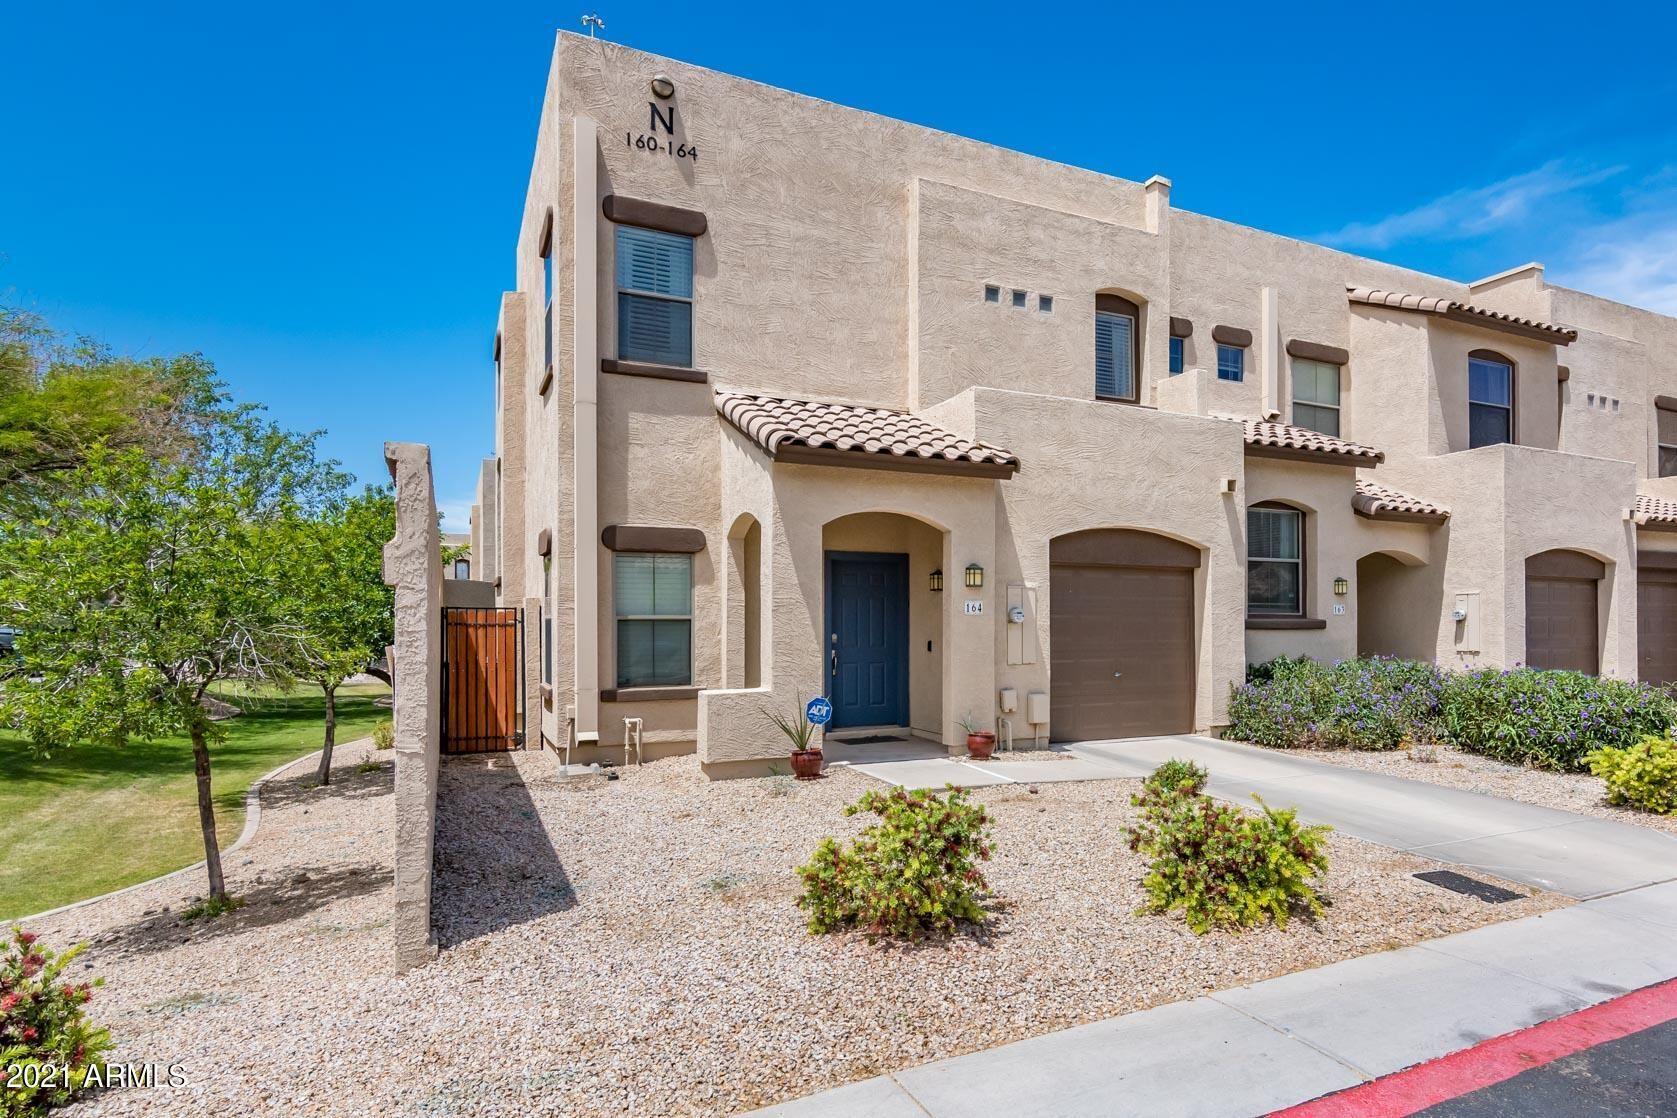 1886 E DON CARLOS Avenue #164, Tempe, AZ 85281 - MLS#: 6232612